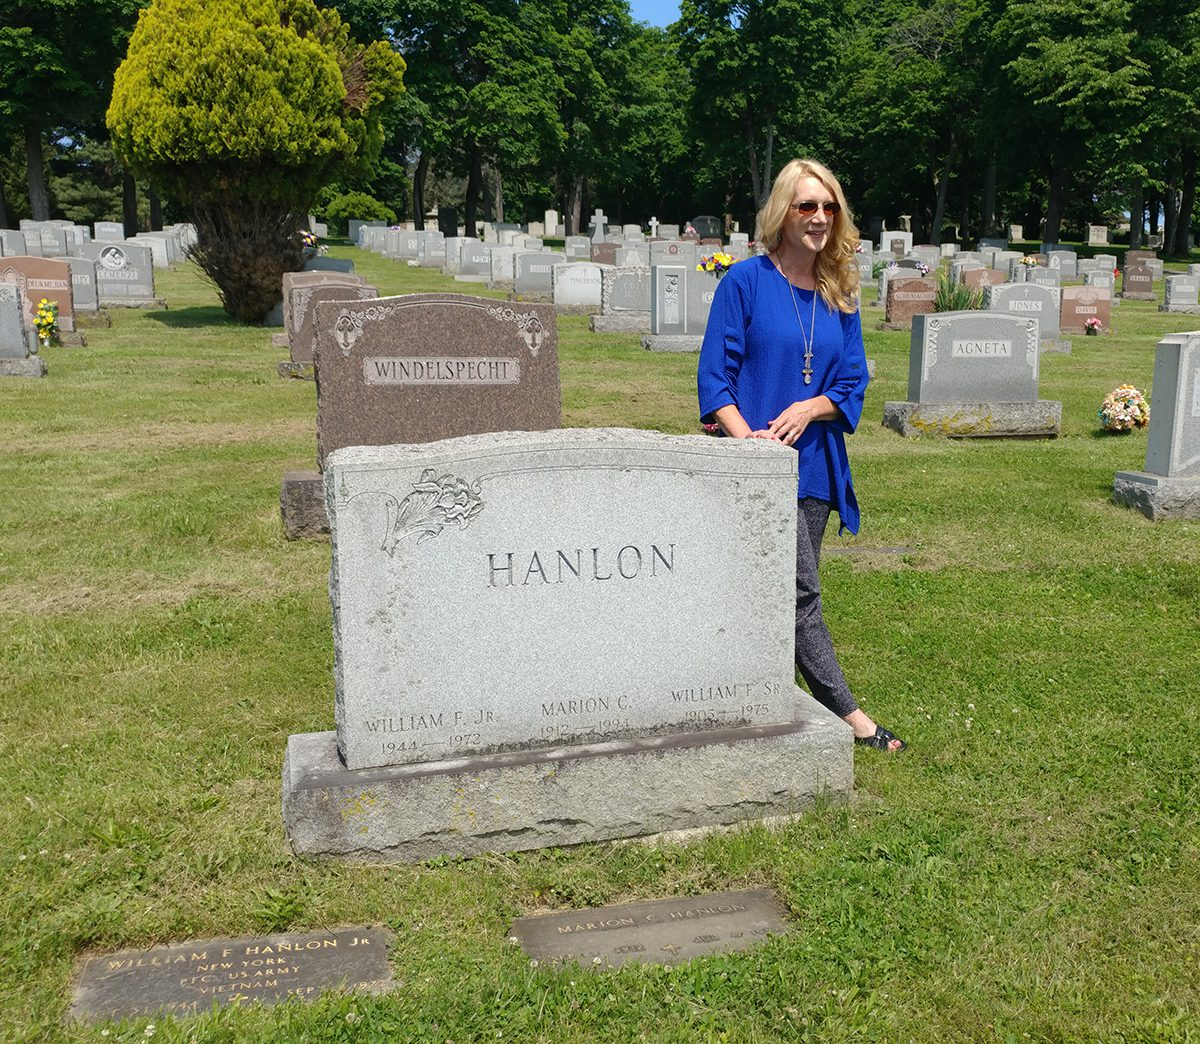 Historian Kelly Grimaldi at Marion Hanlon's gravesite.